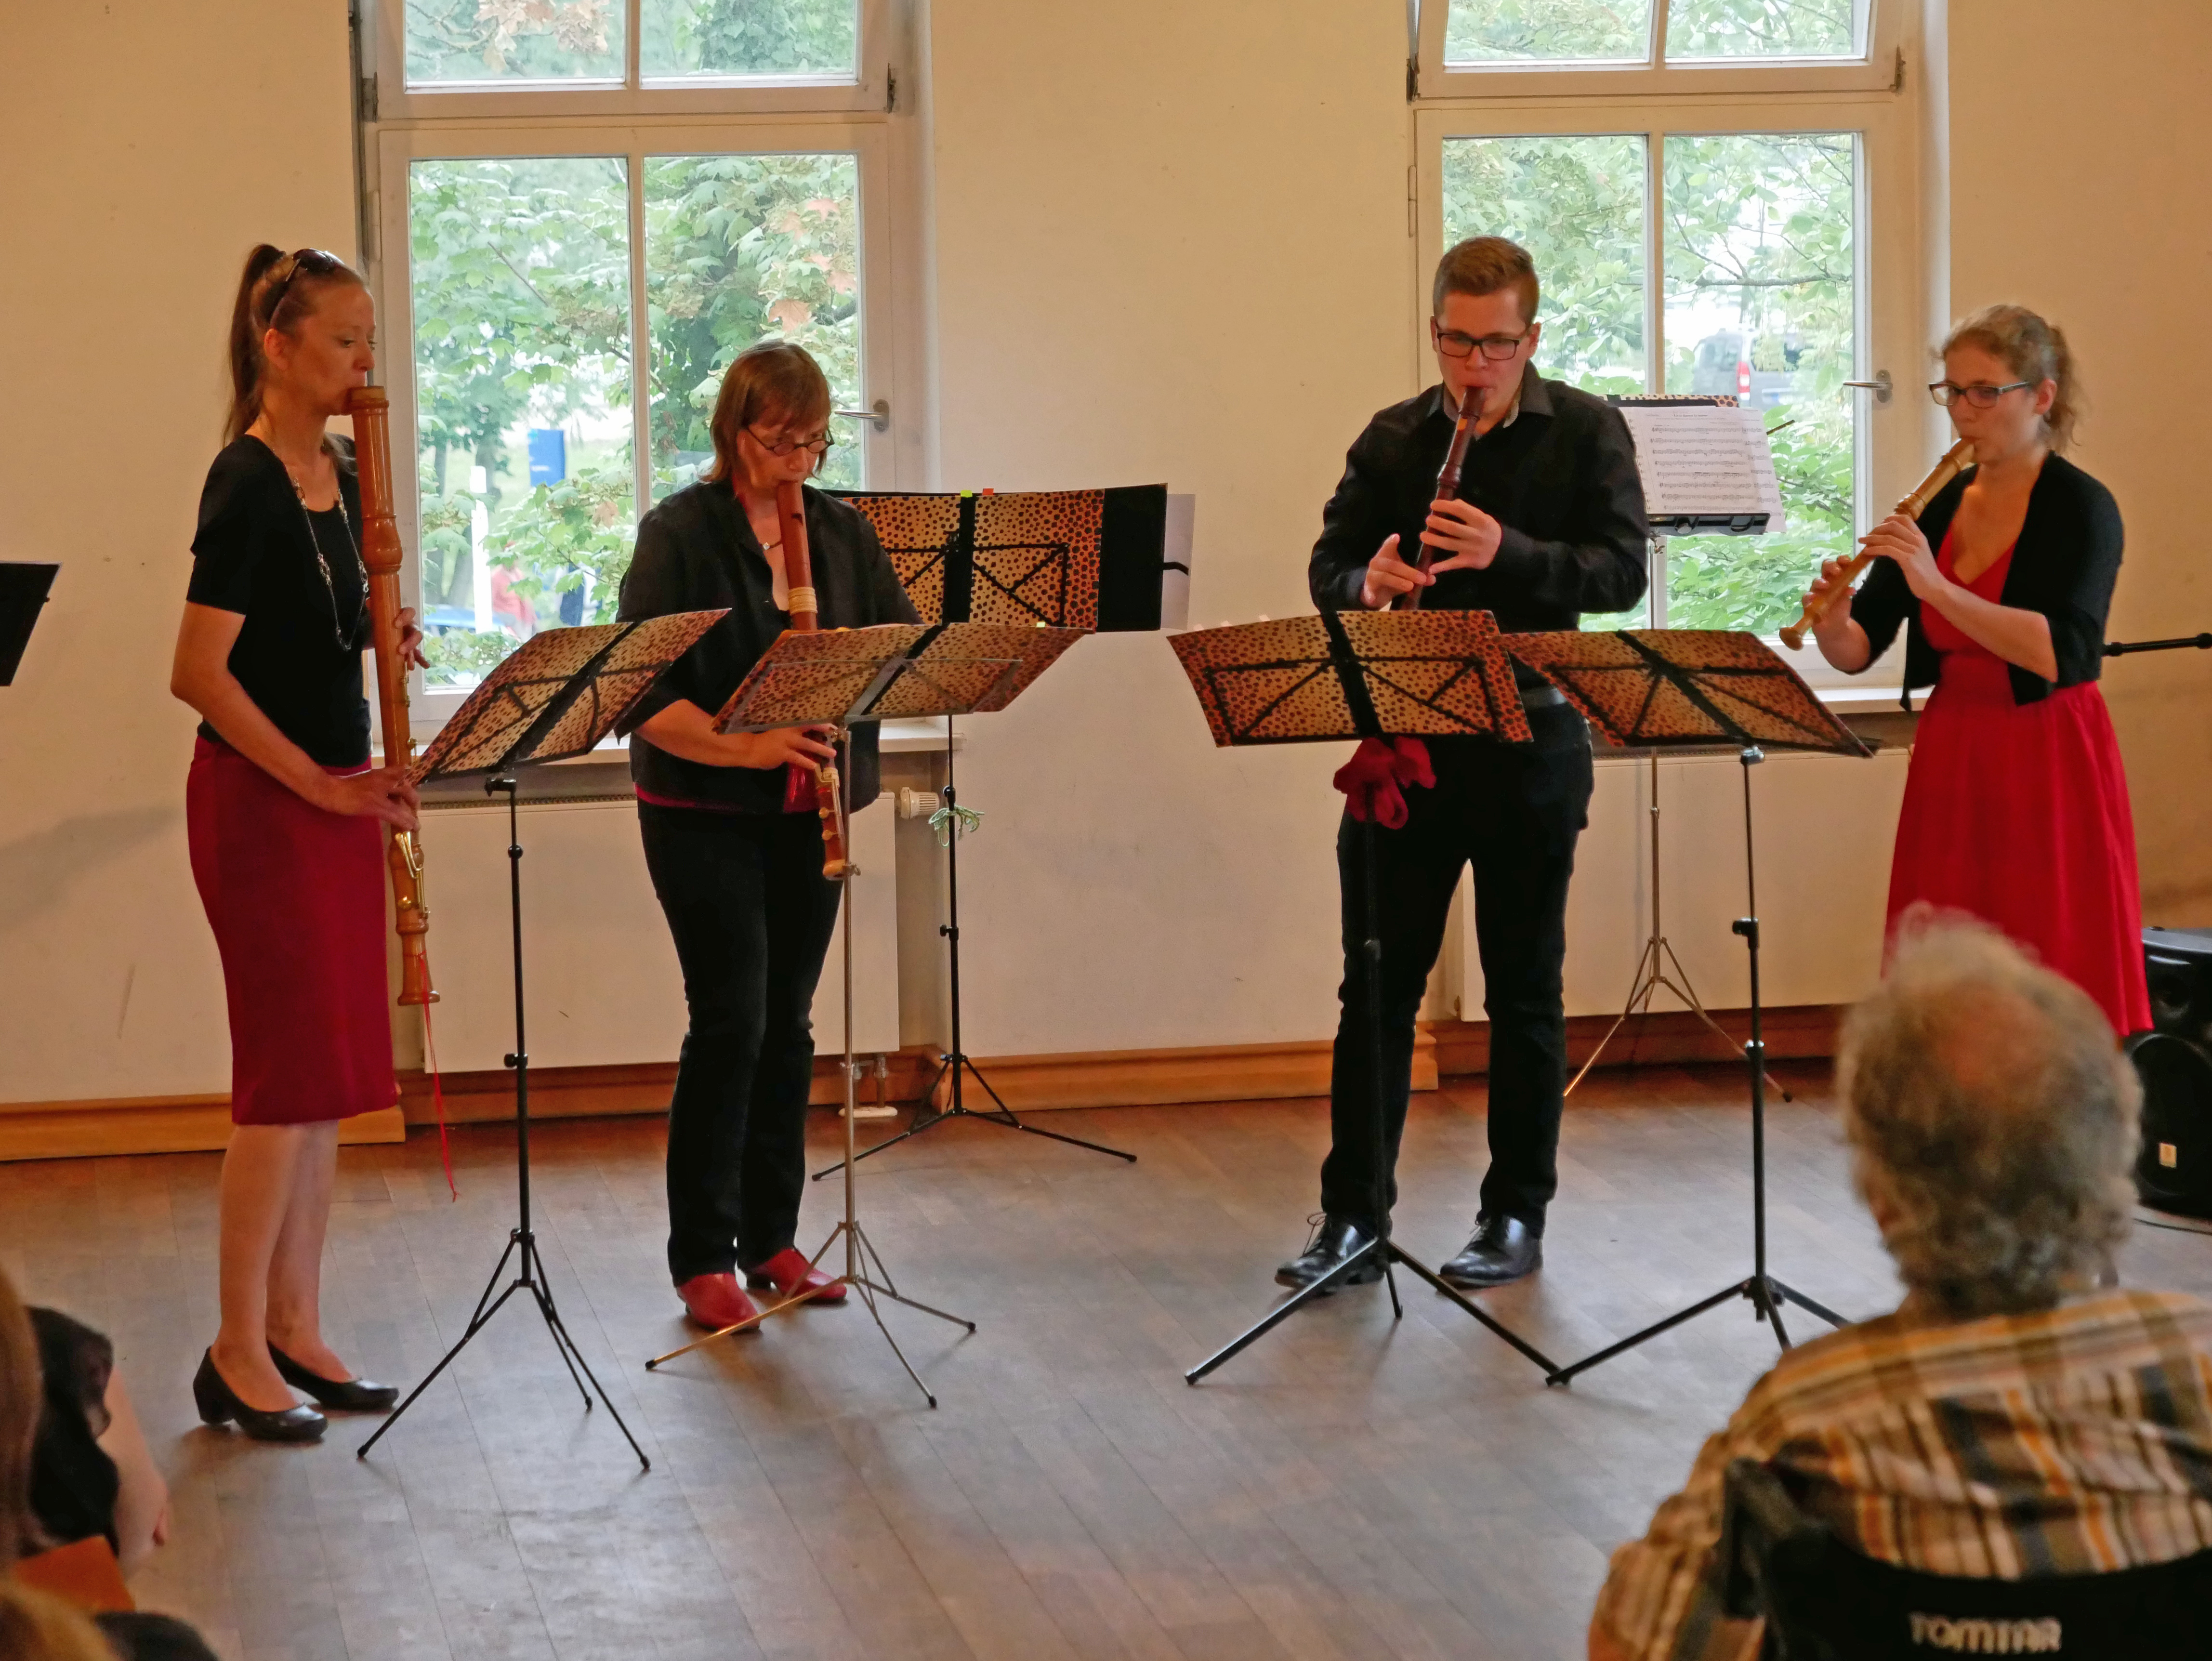 Blockflötenquartett Saltarello mit Sopranflöte, Altflöte, Tenorflöte und Bassflöte